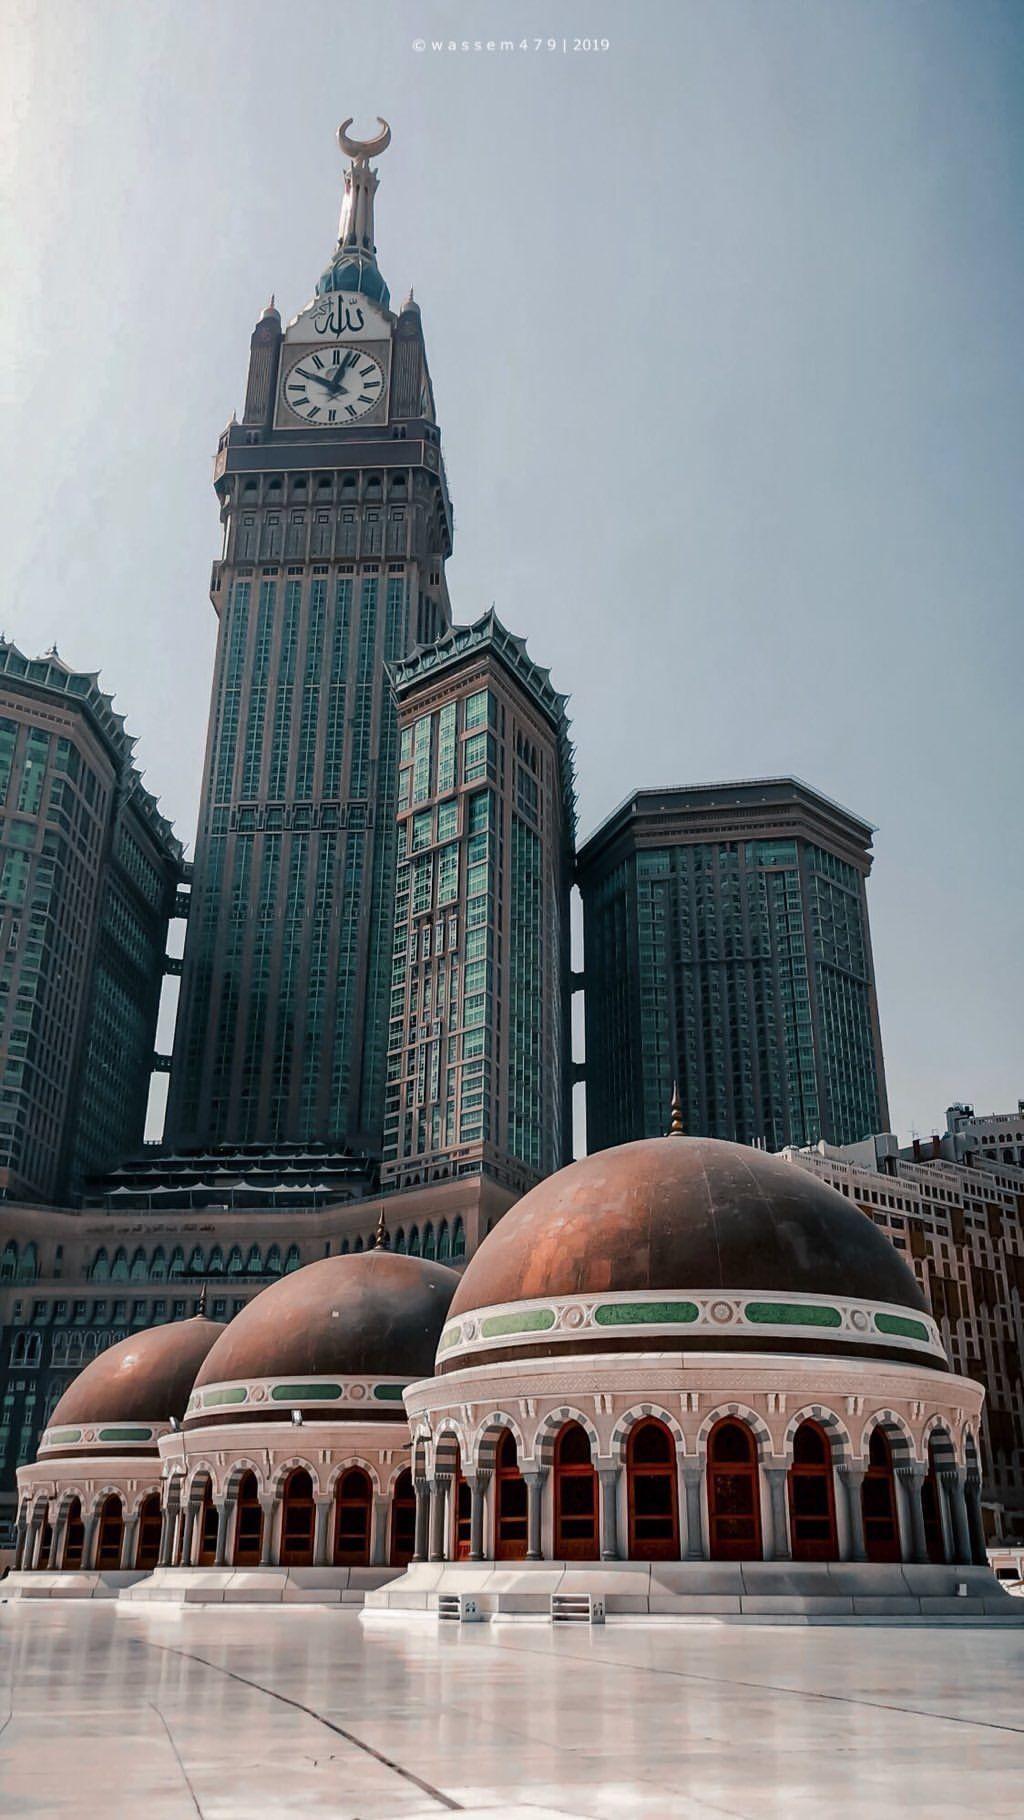 Pin Oleh فتاة الإسلام Di Makkah Arsitektur Masjid Arsitektur Mekah